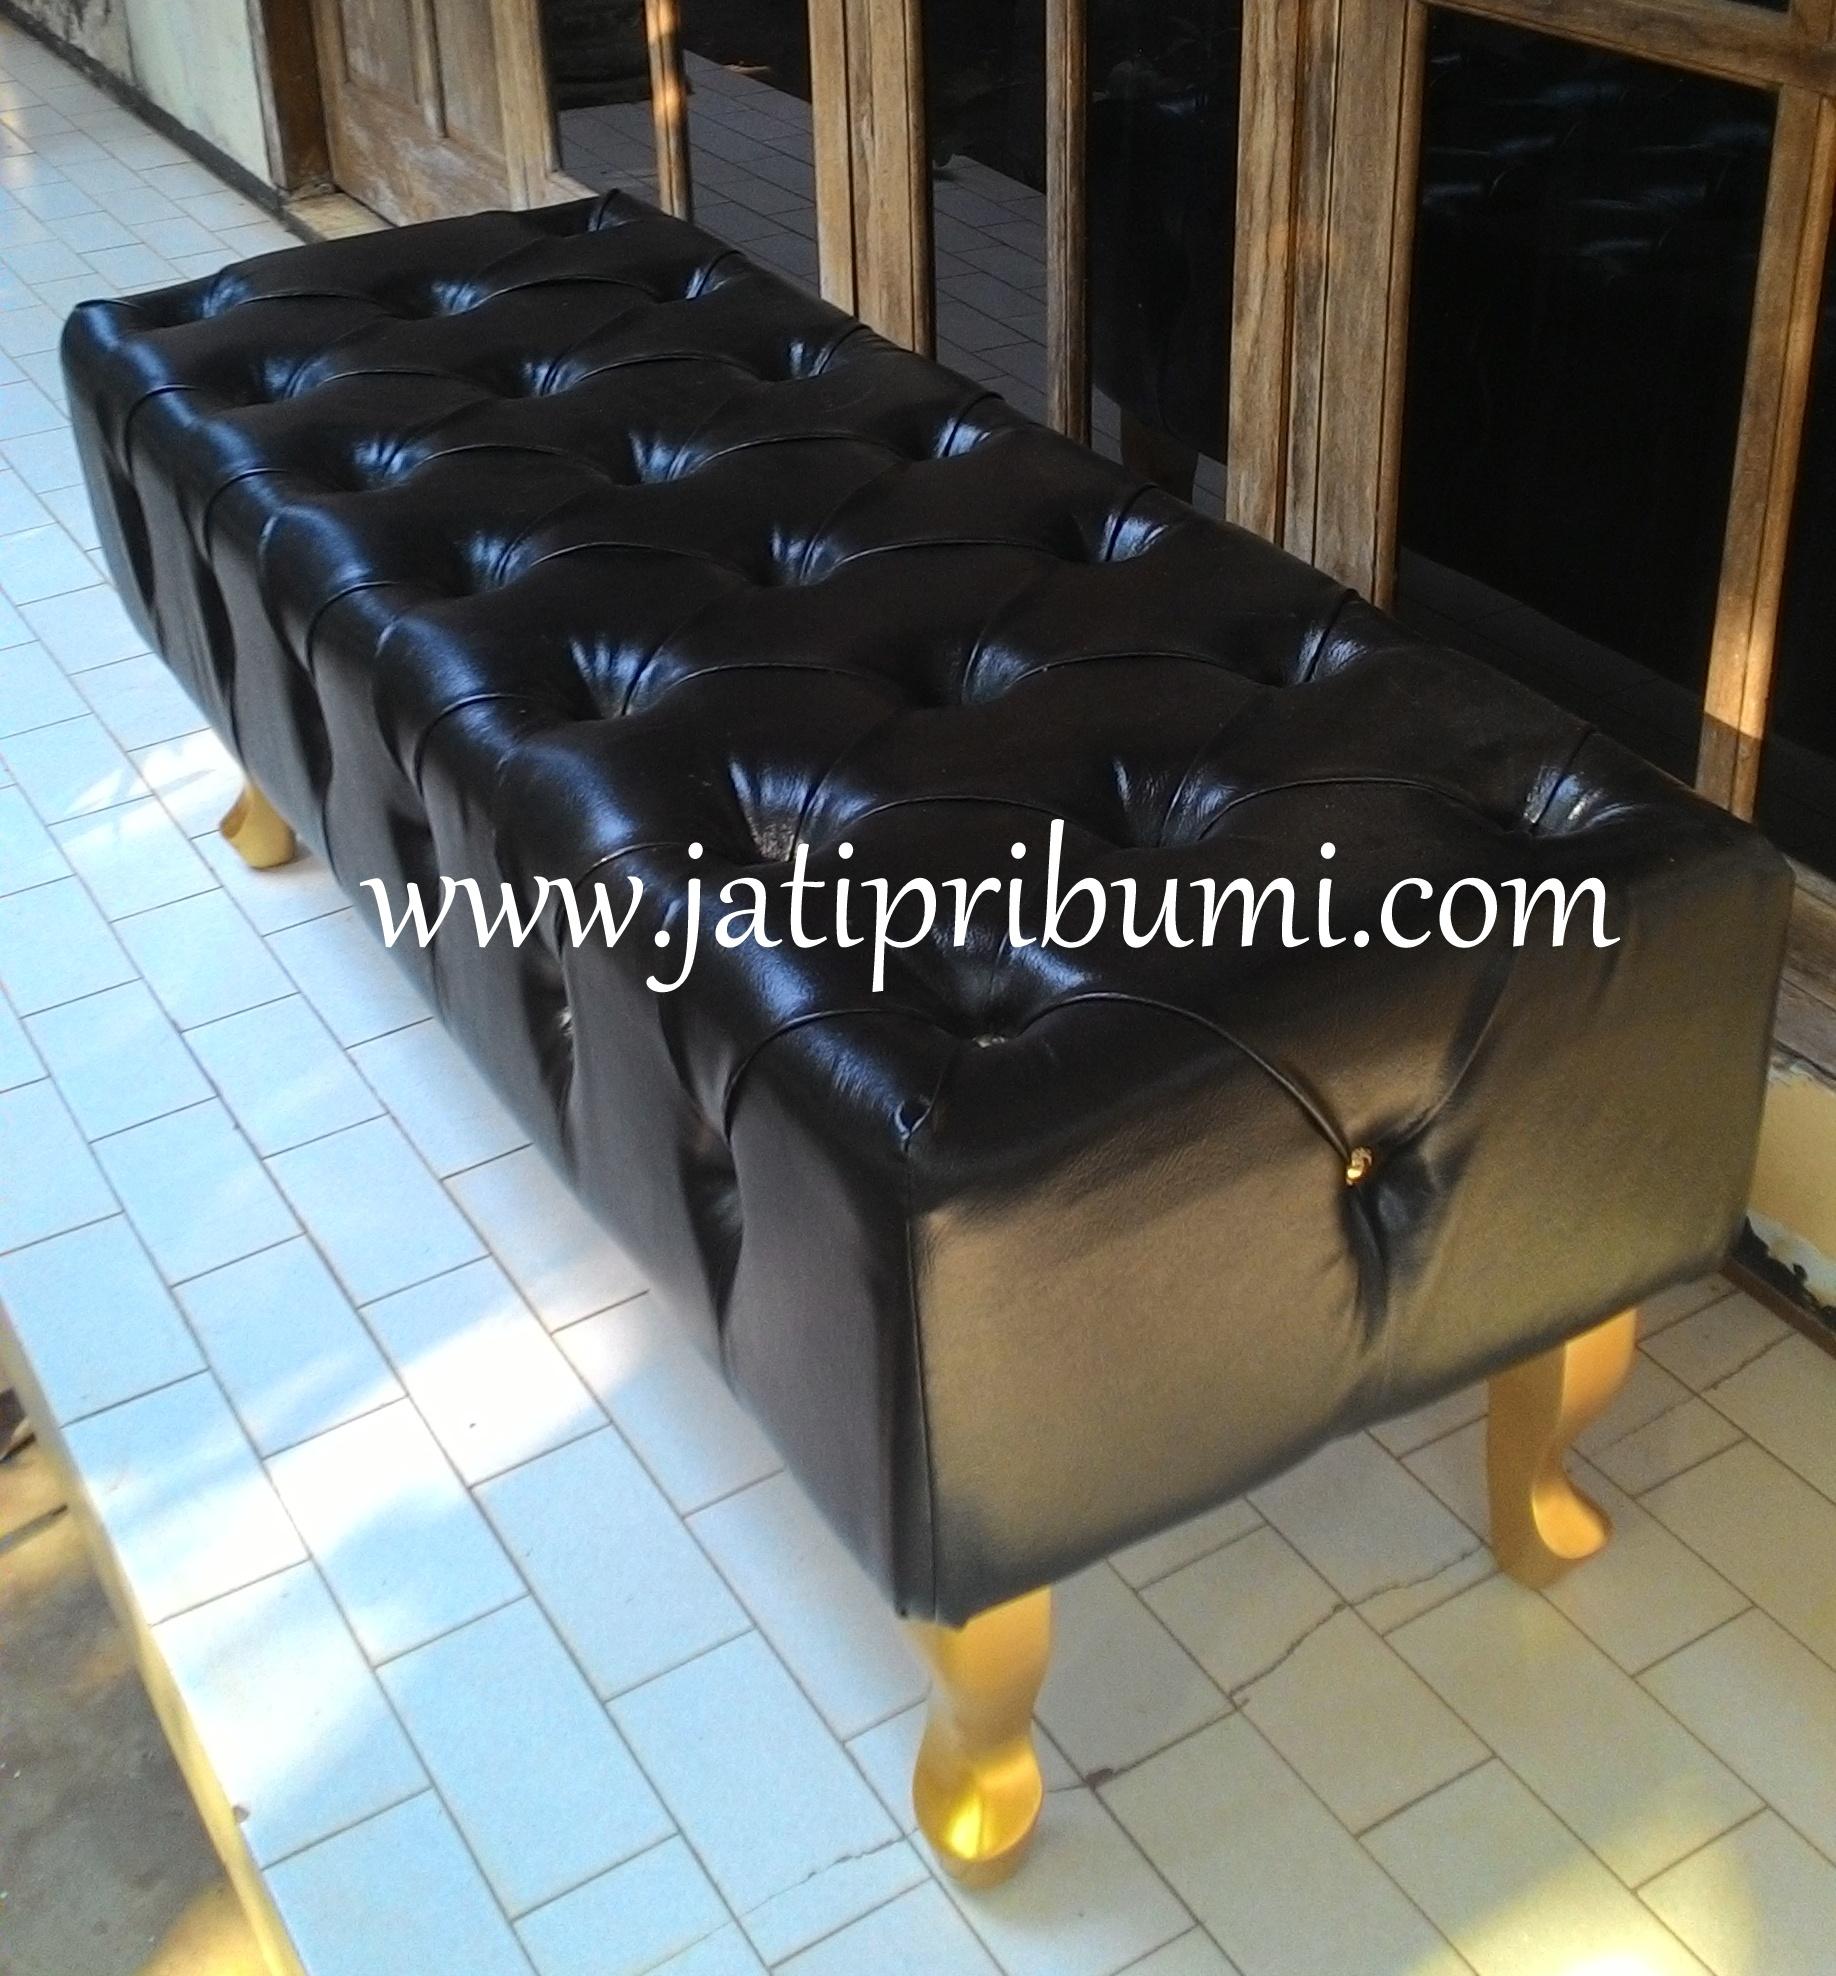 sofa stool tempat tidur jati pribumi